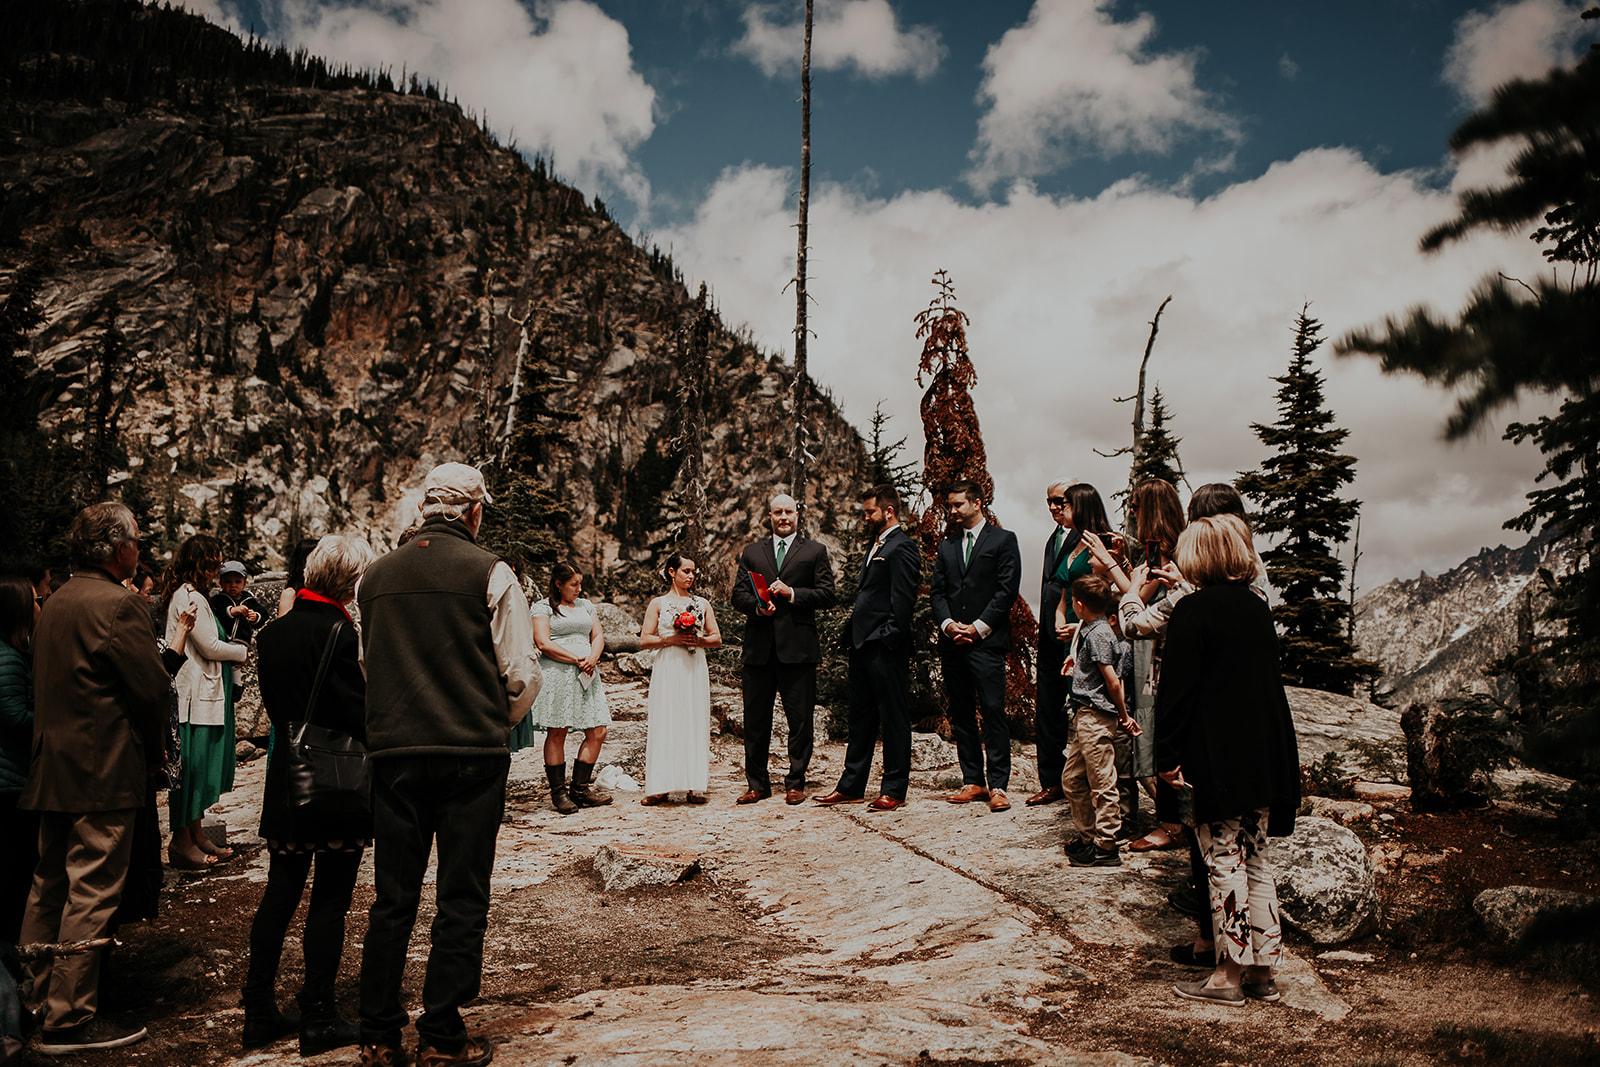 winthrop-wedding-photographer-megan-gallagher-photography (9).jpg